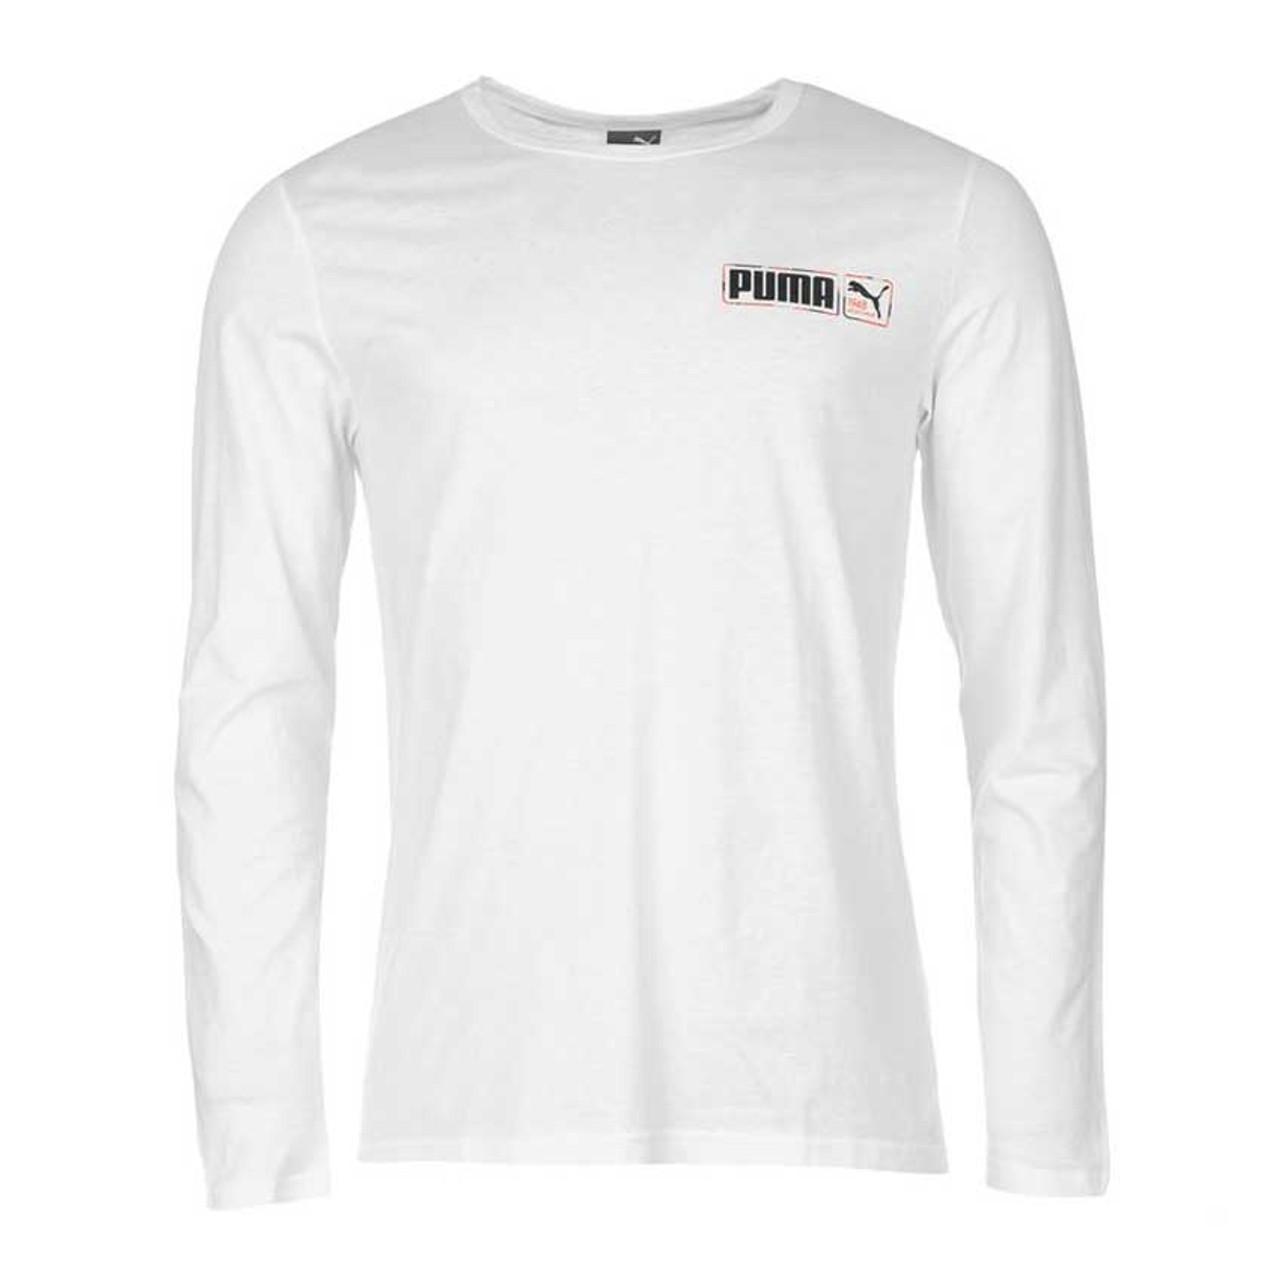 926c5998 PUMA mens fun long sleeved t-shirt [white] SMALL